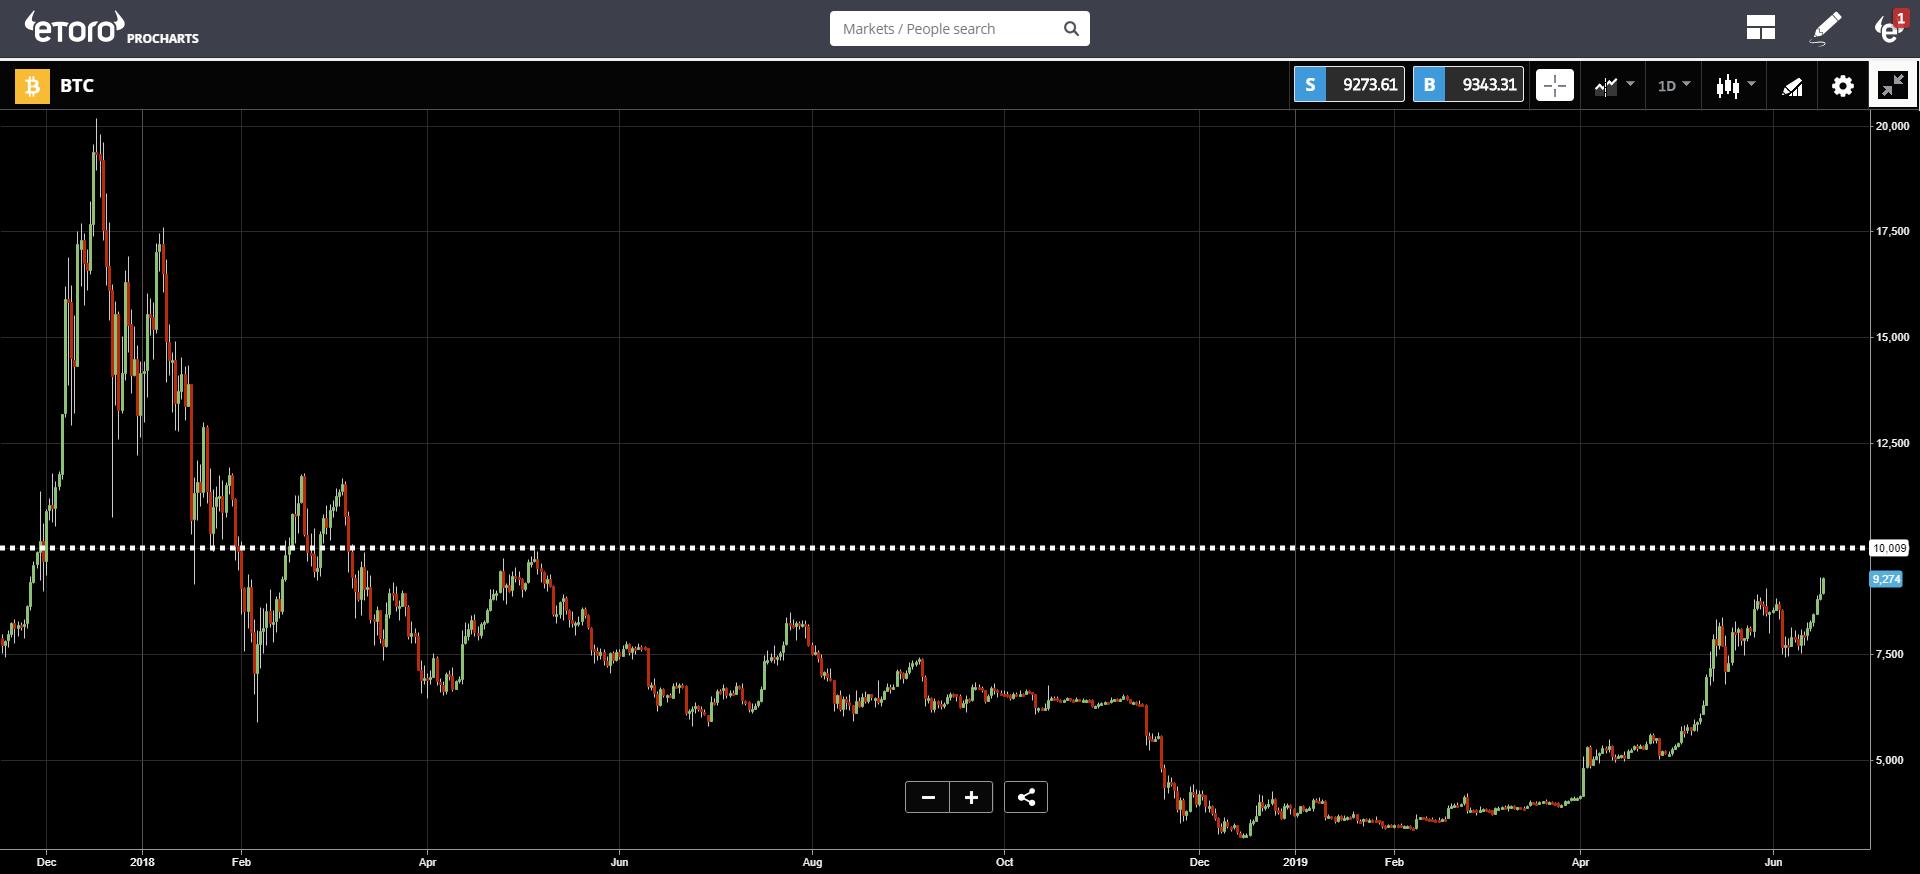 market, trading, cryptocurrency, hong kong, bitcoin,